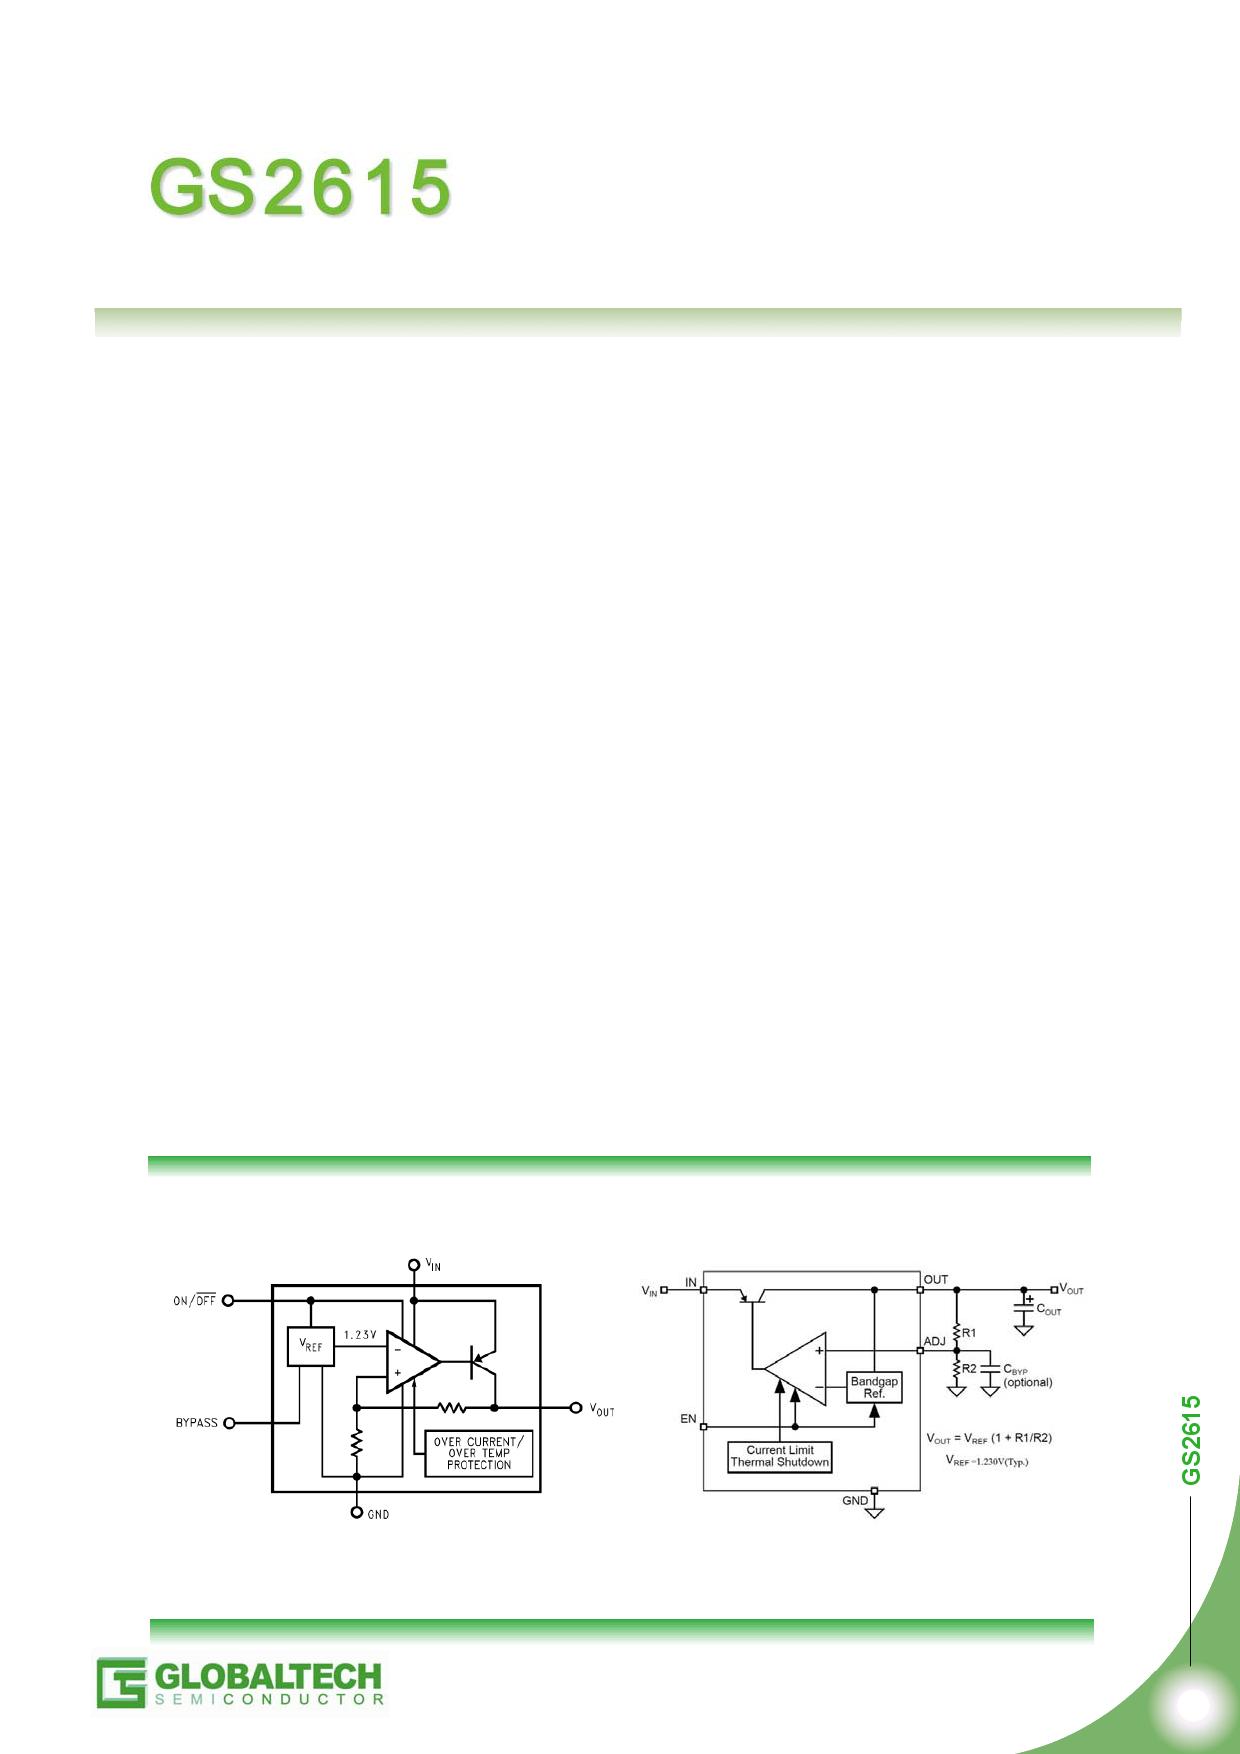 GS2615 datasheet